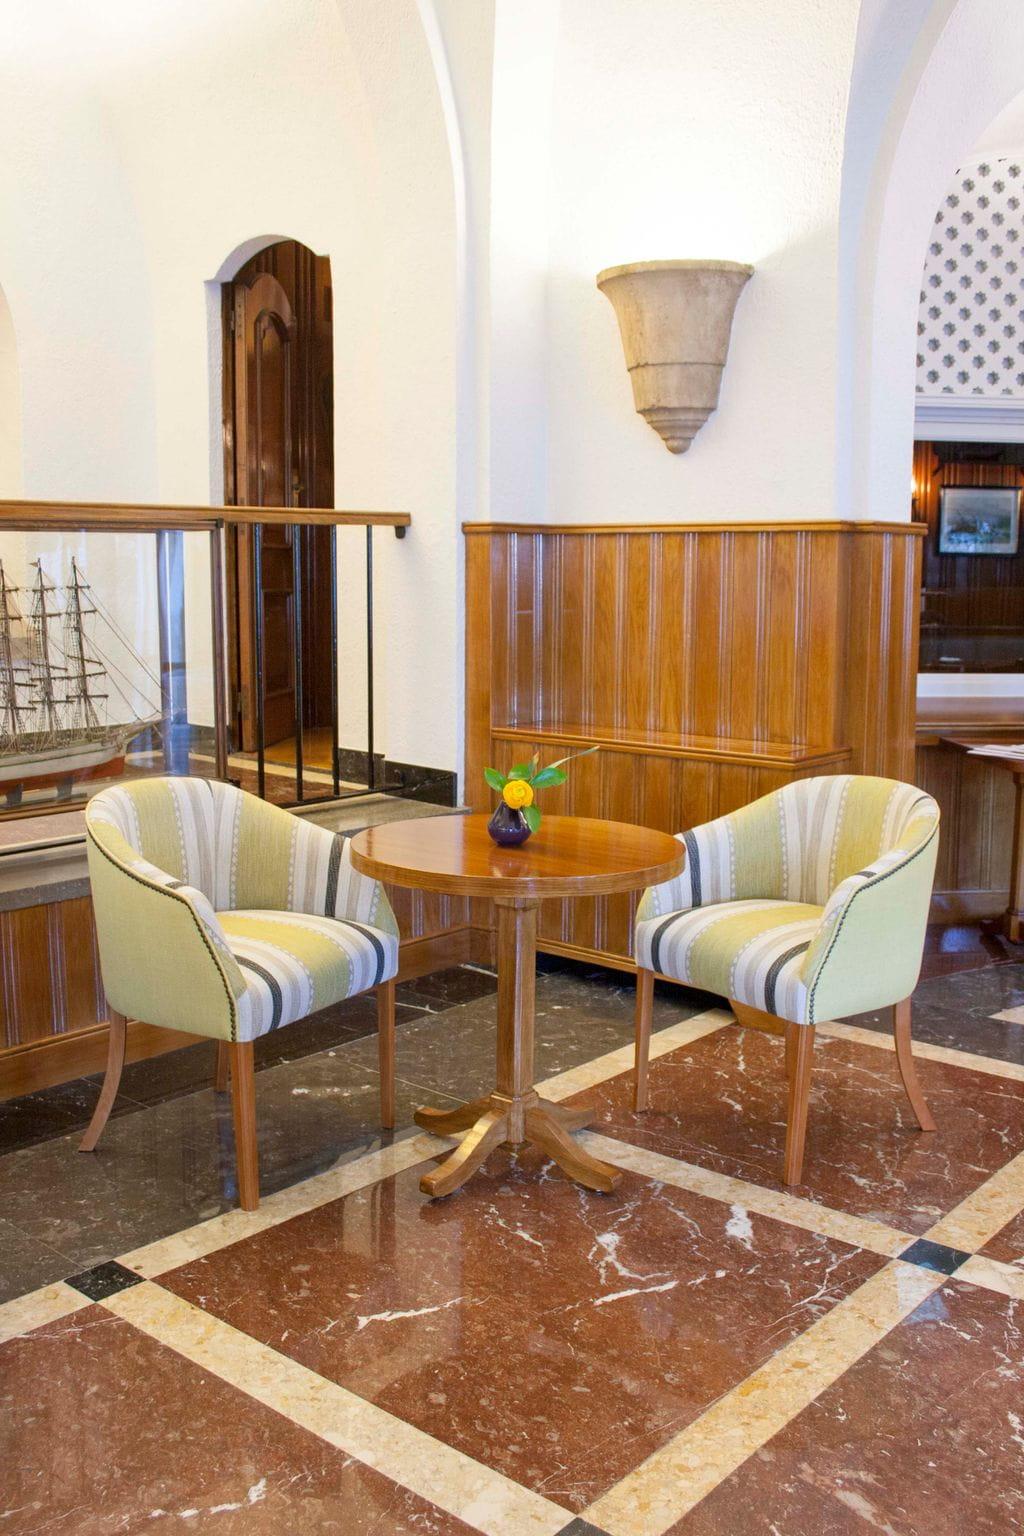 Hotel la gavina crearte collections for Hotel la gavina